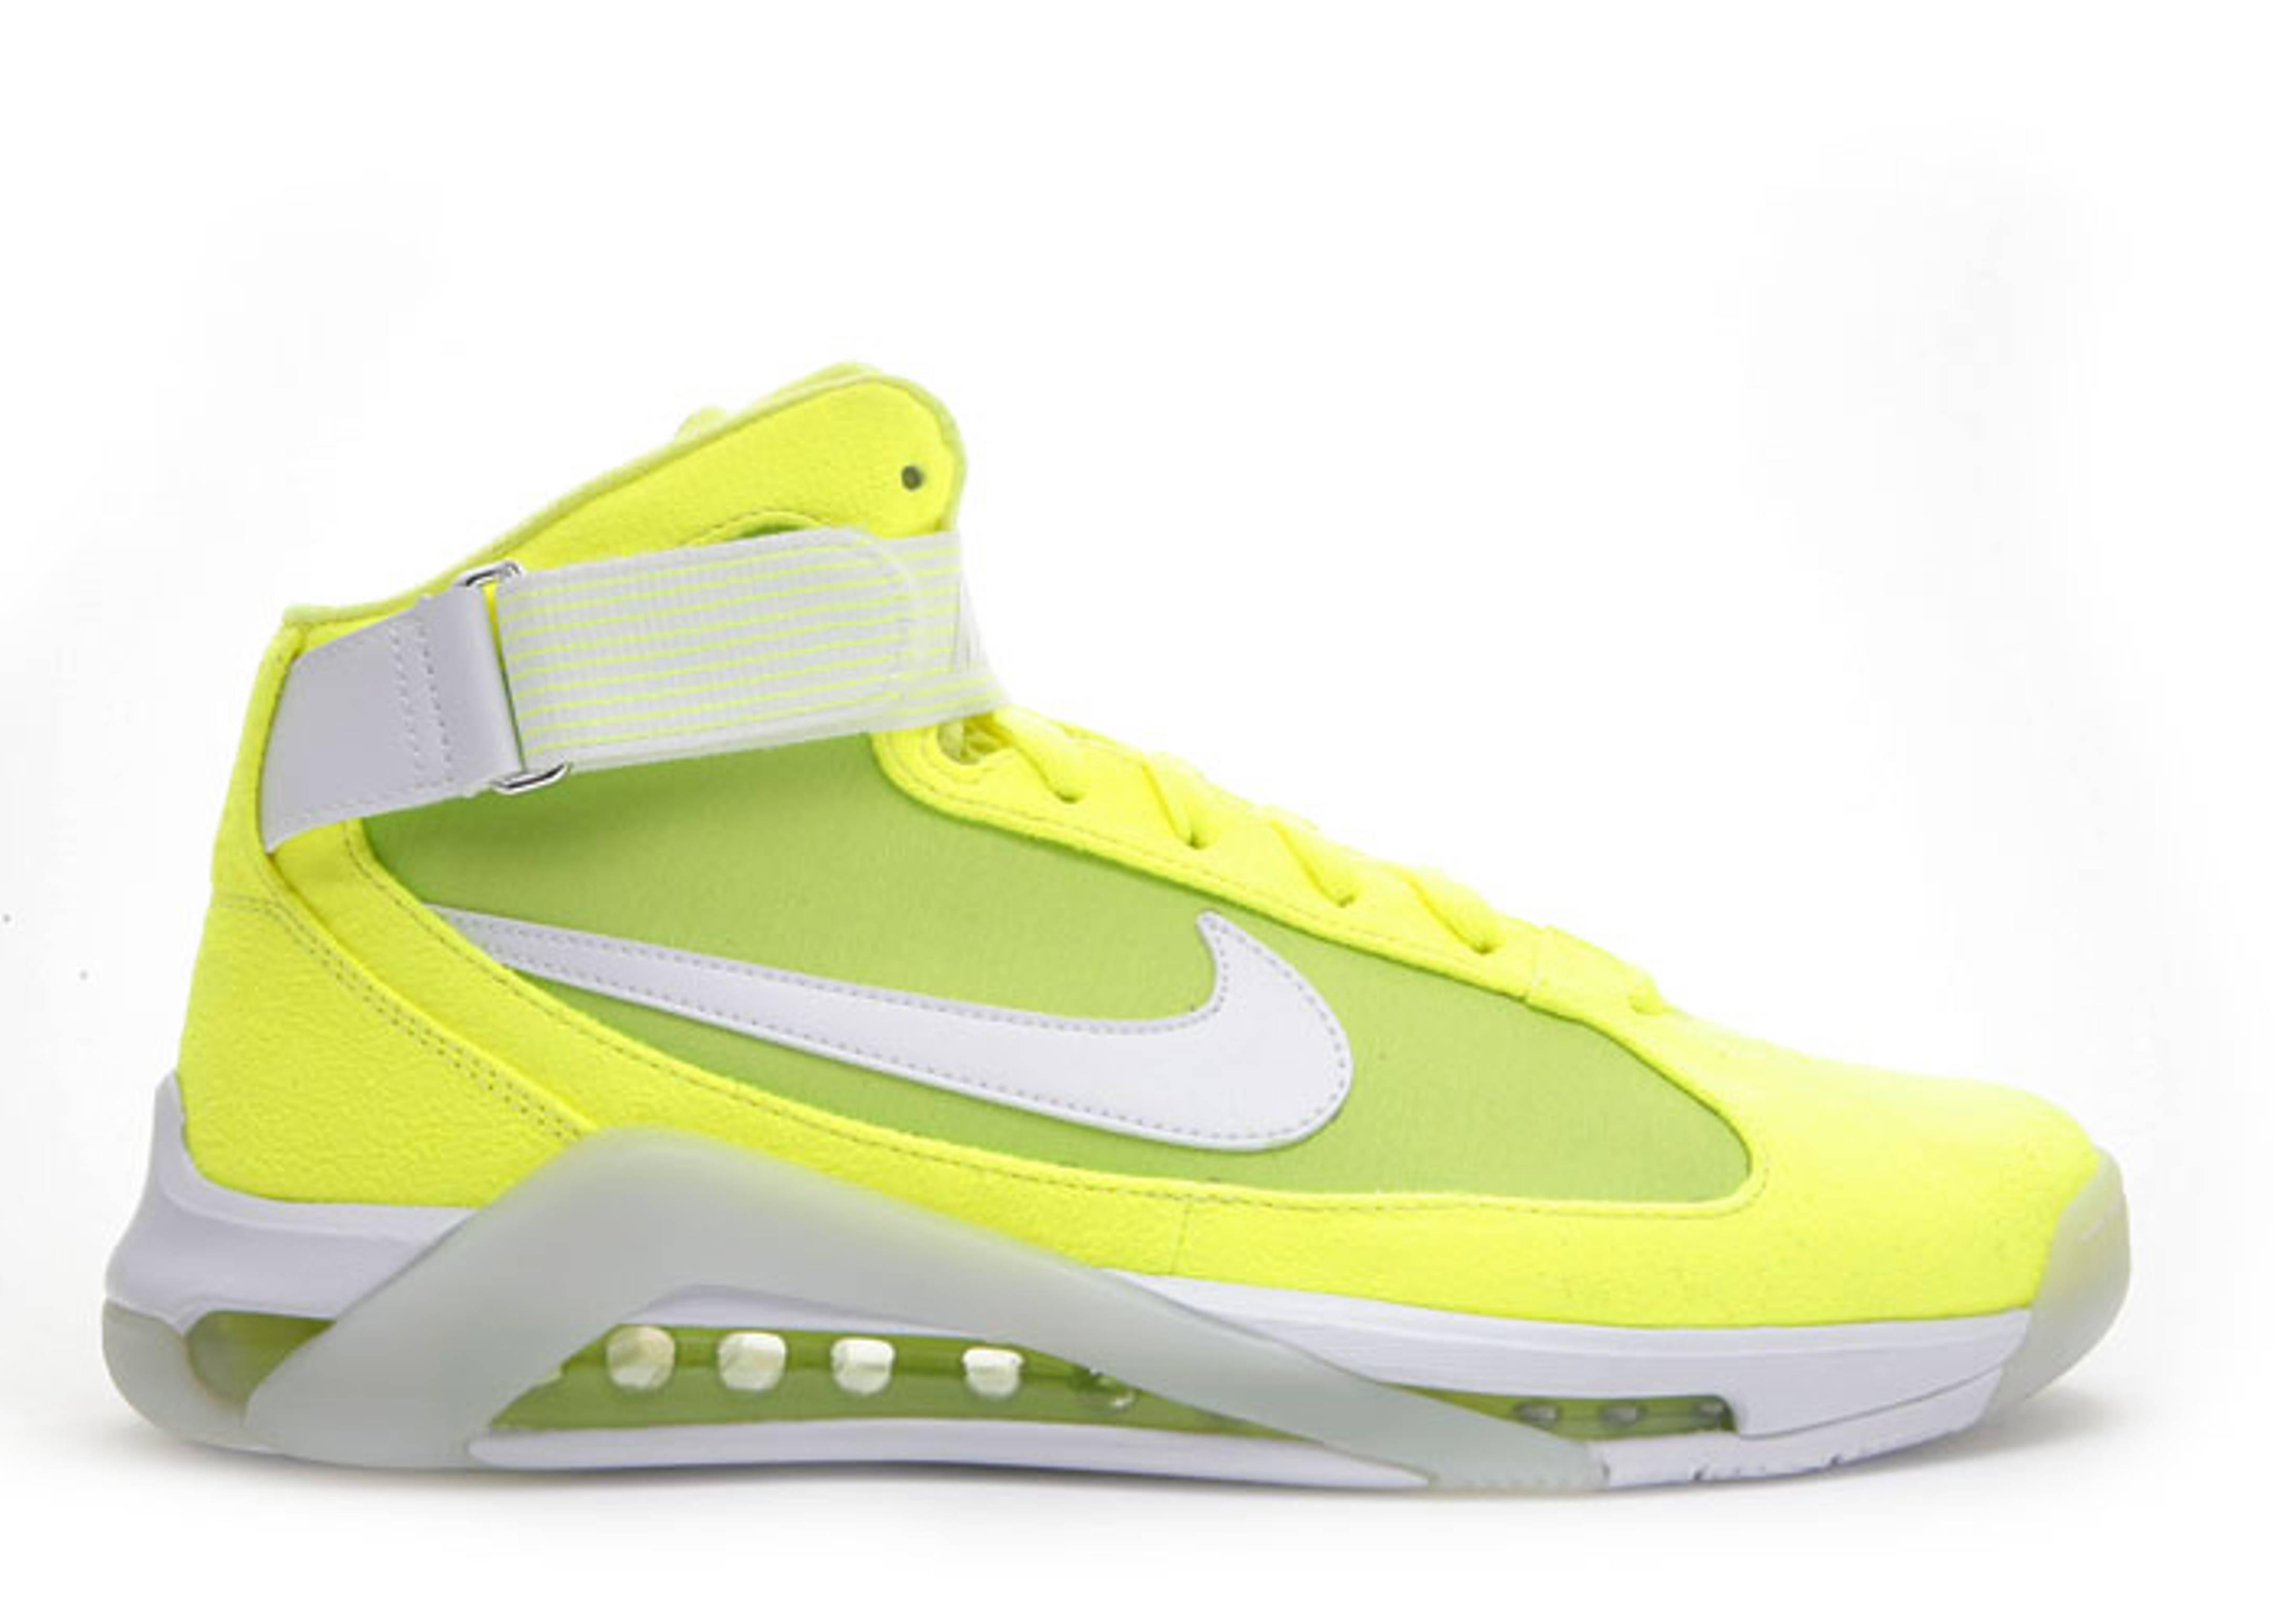 bdda358b210952 ... Hypermax Nfw Tennis Ball Neon Yellow White Flight Club Nike Hypermax -  Carlos Boozer PE ...